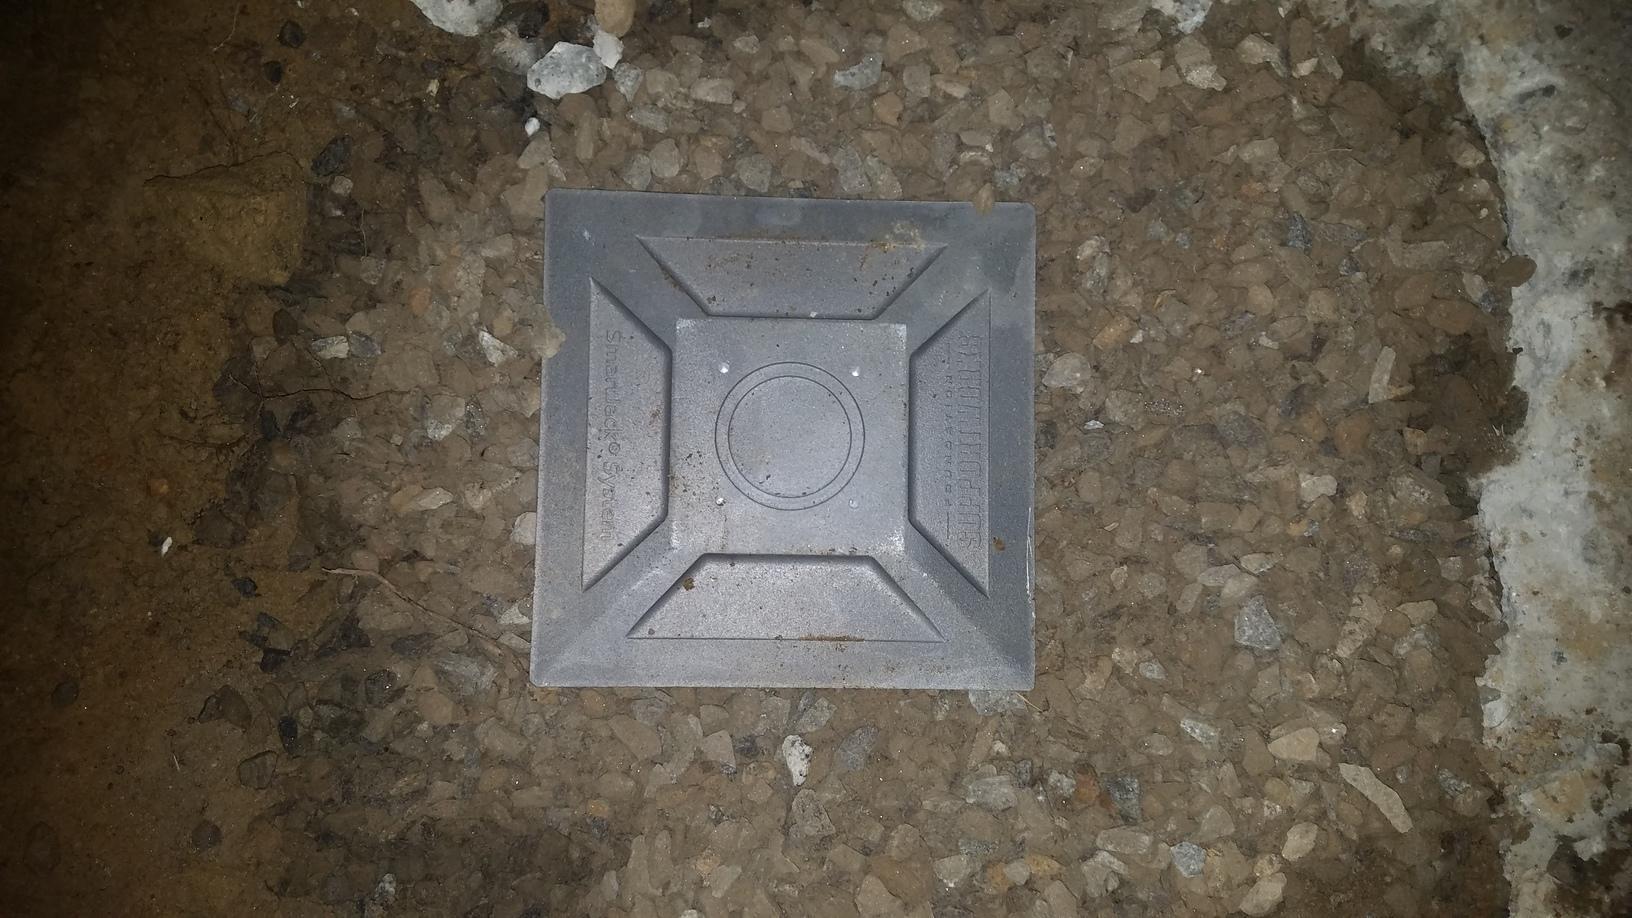 Engineered filled hole